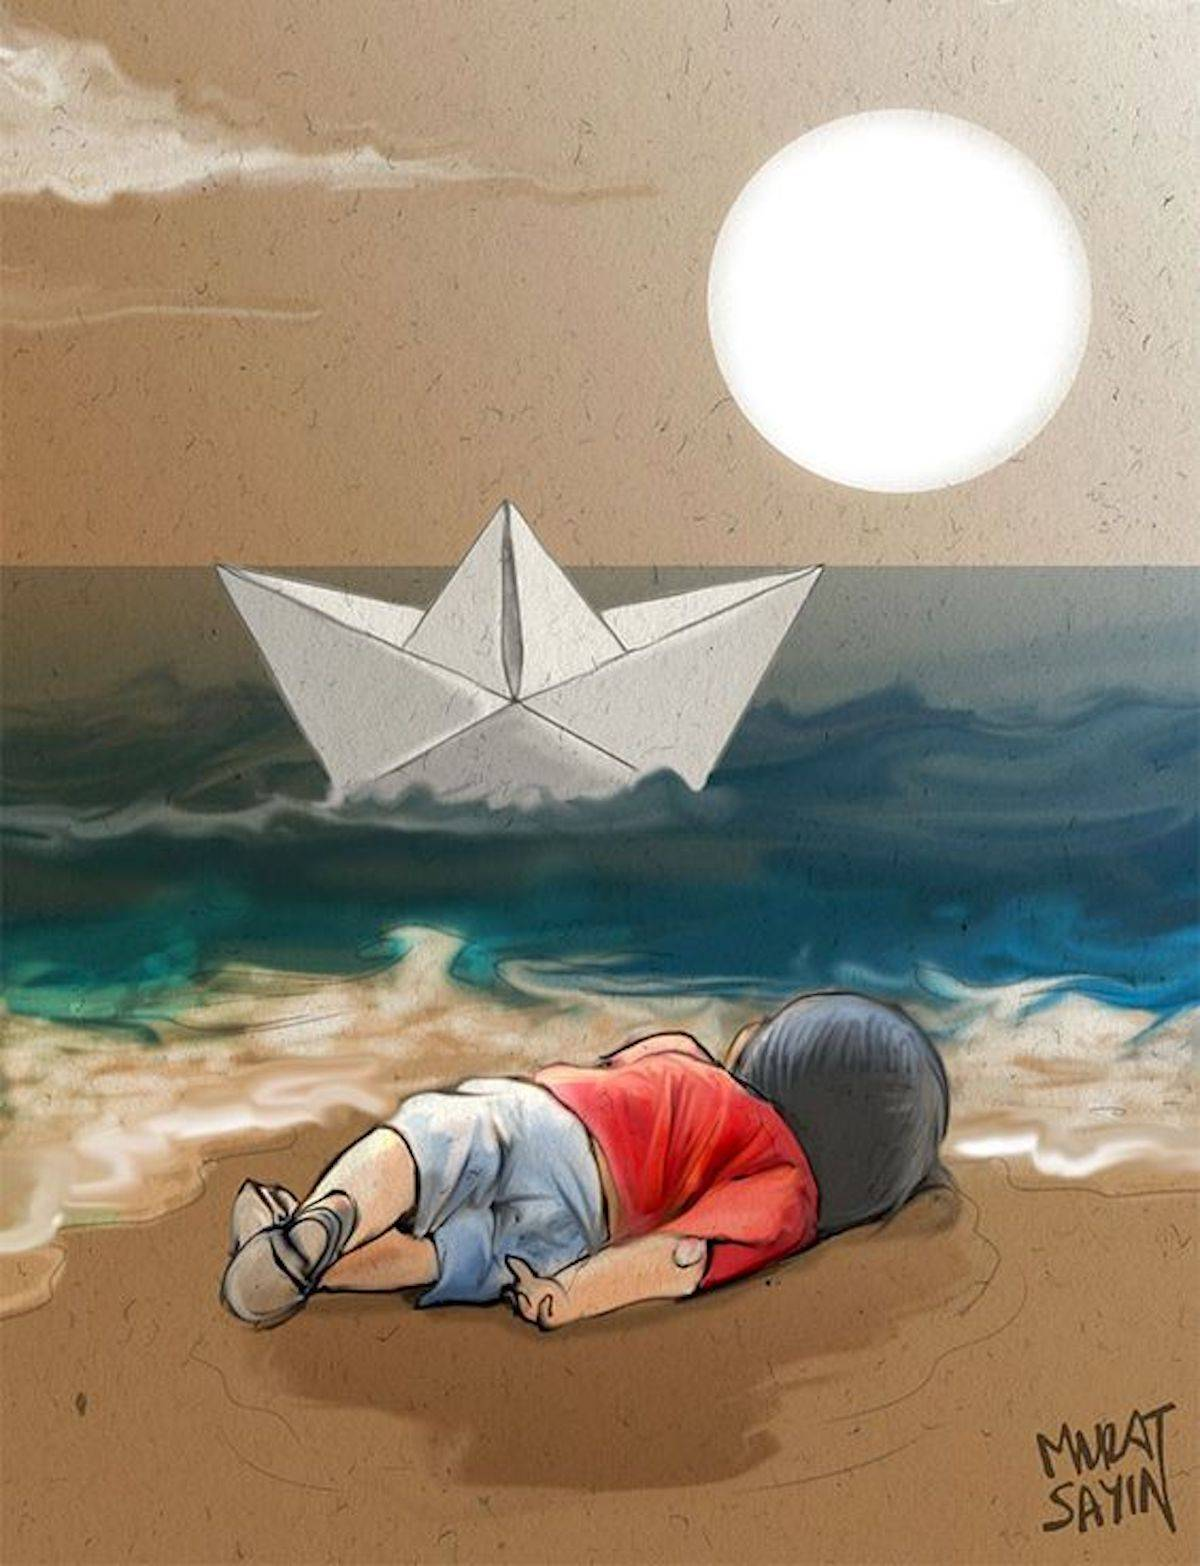 Genocidio - Illustration by Murat Sayin